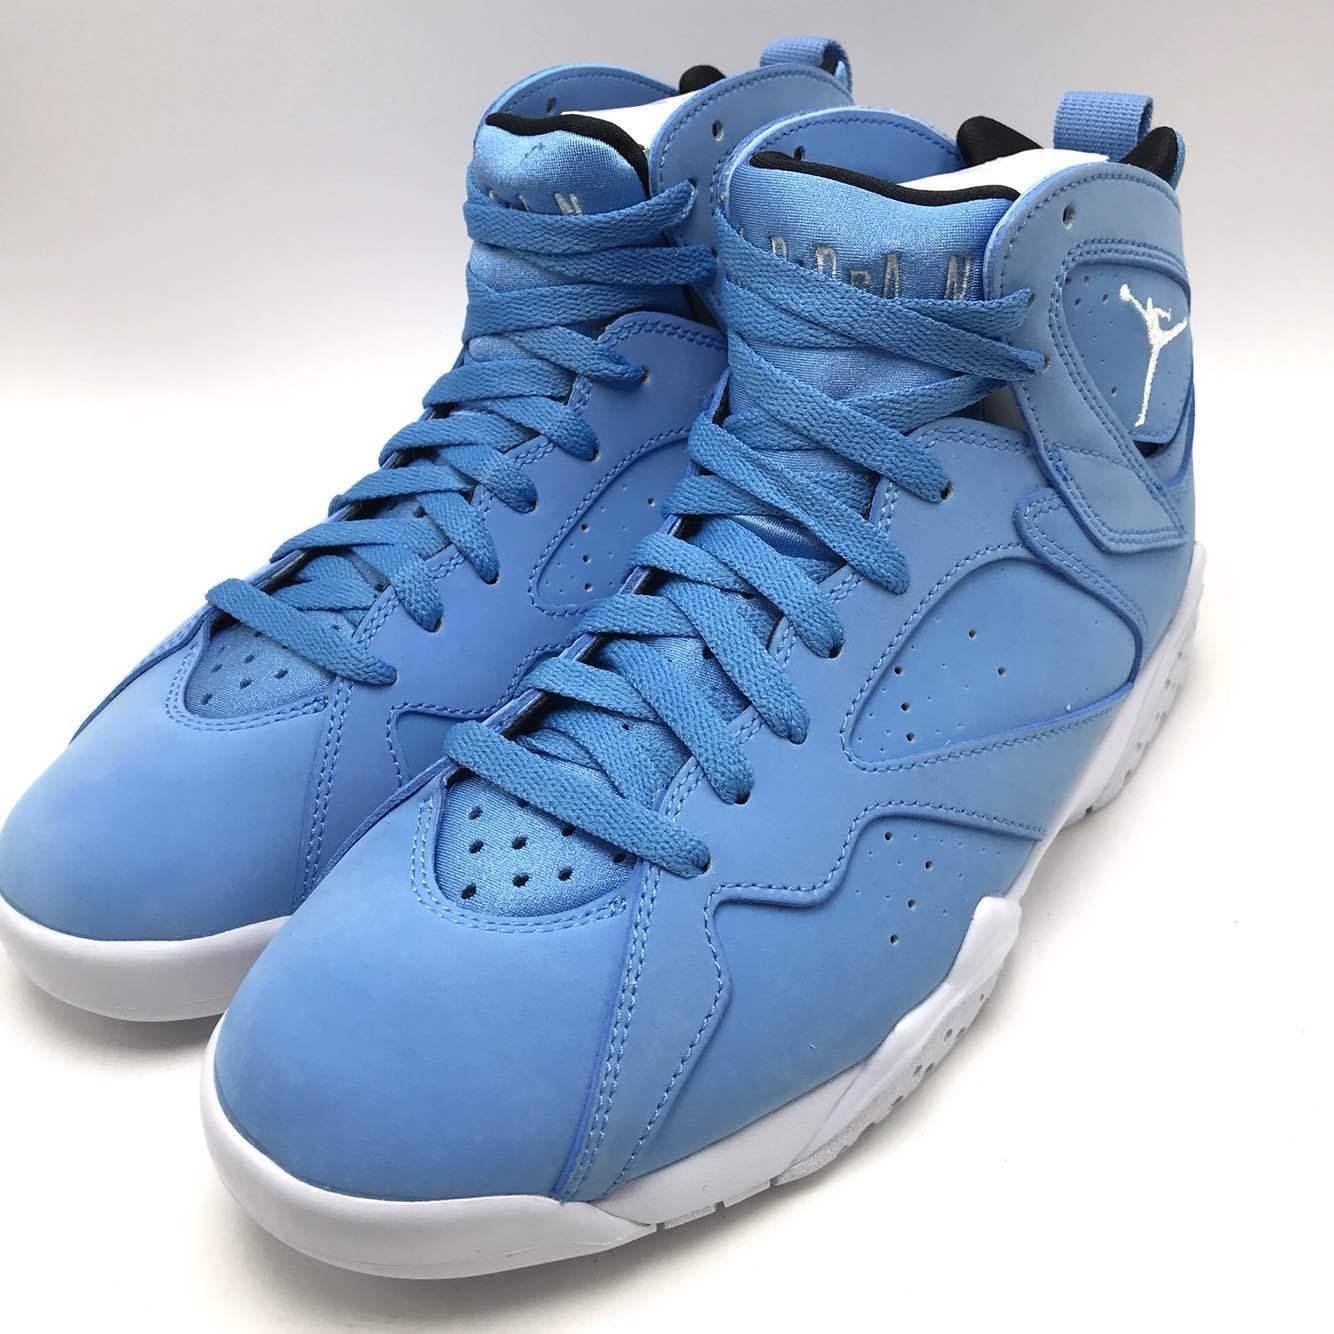 fec7f8974ac160 Nike Air Jordan 7 Retro Men's Basketball Shoes - 11 US, University ...